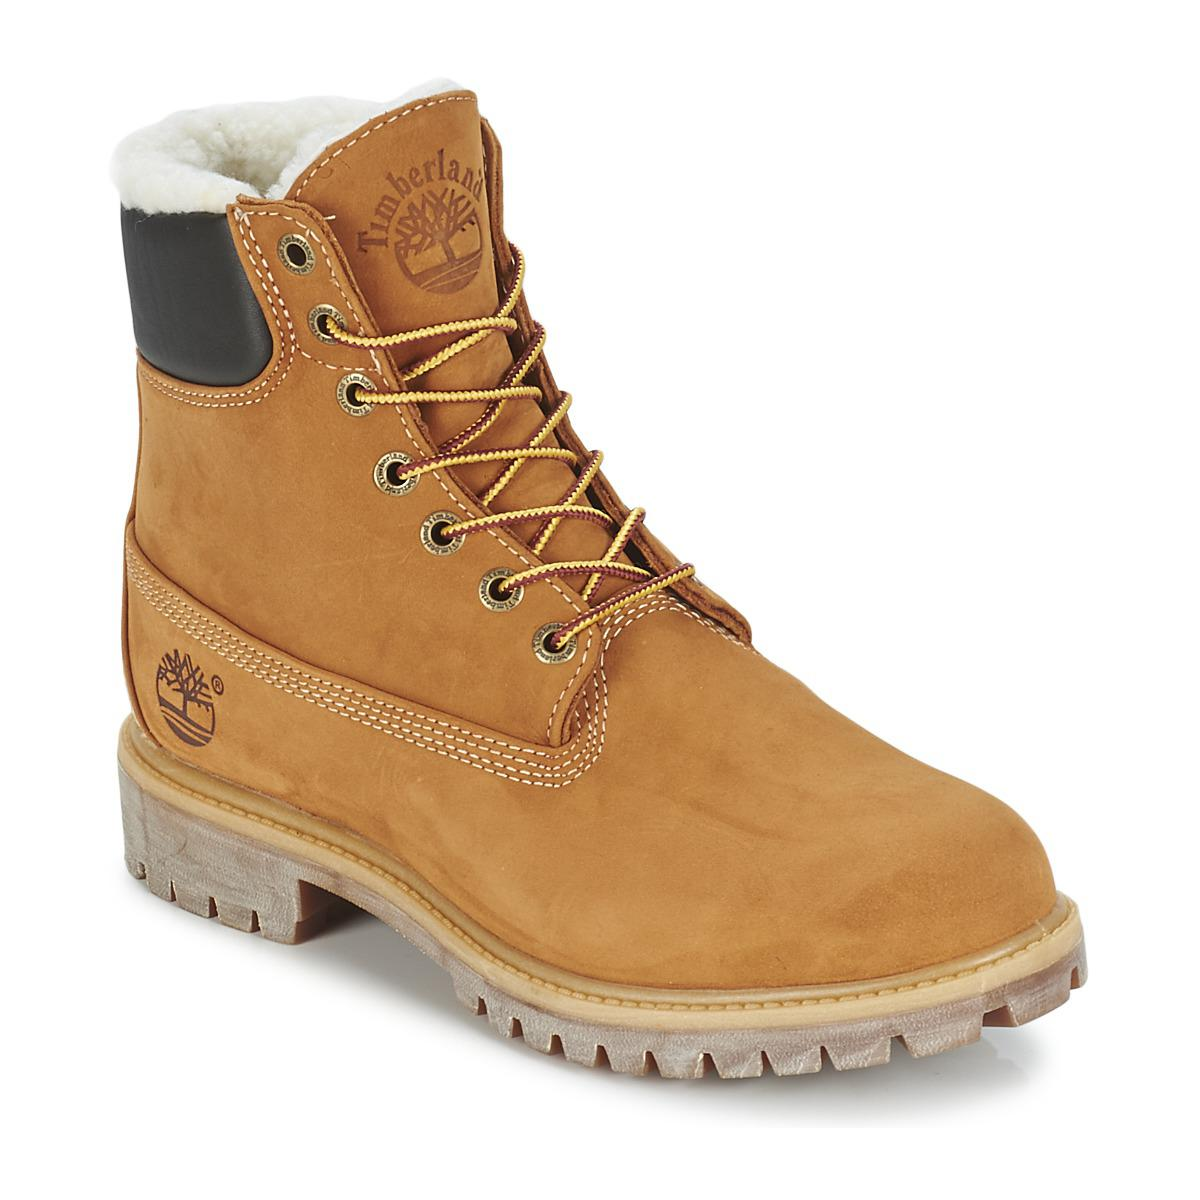 6bdbac979fc7 Timberland 6 In Premium Fur warm Lined Boot Men s Mid Boots In Beige ...